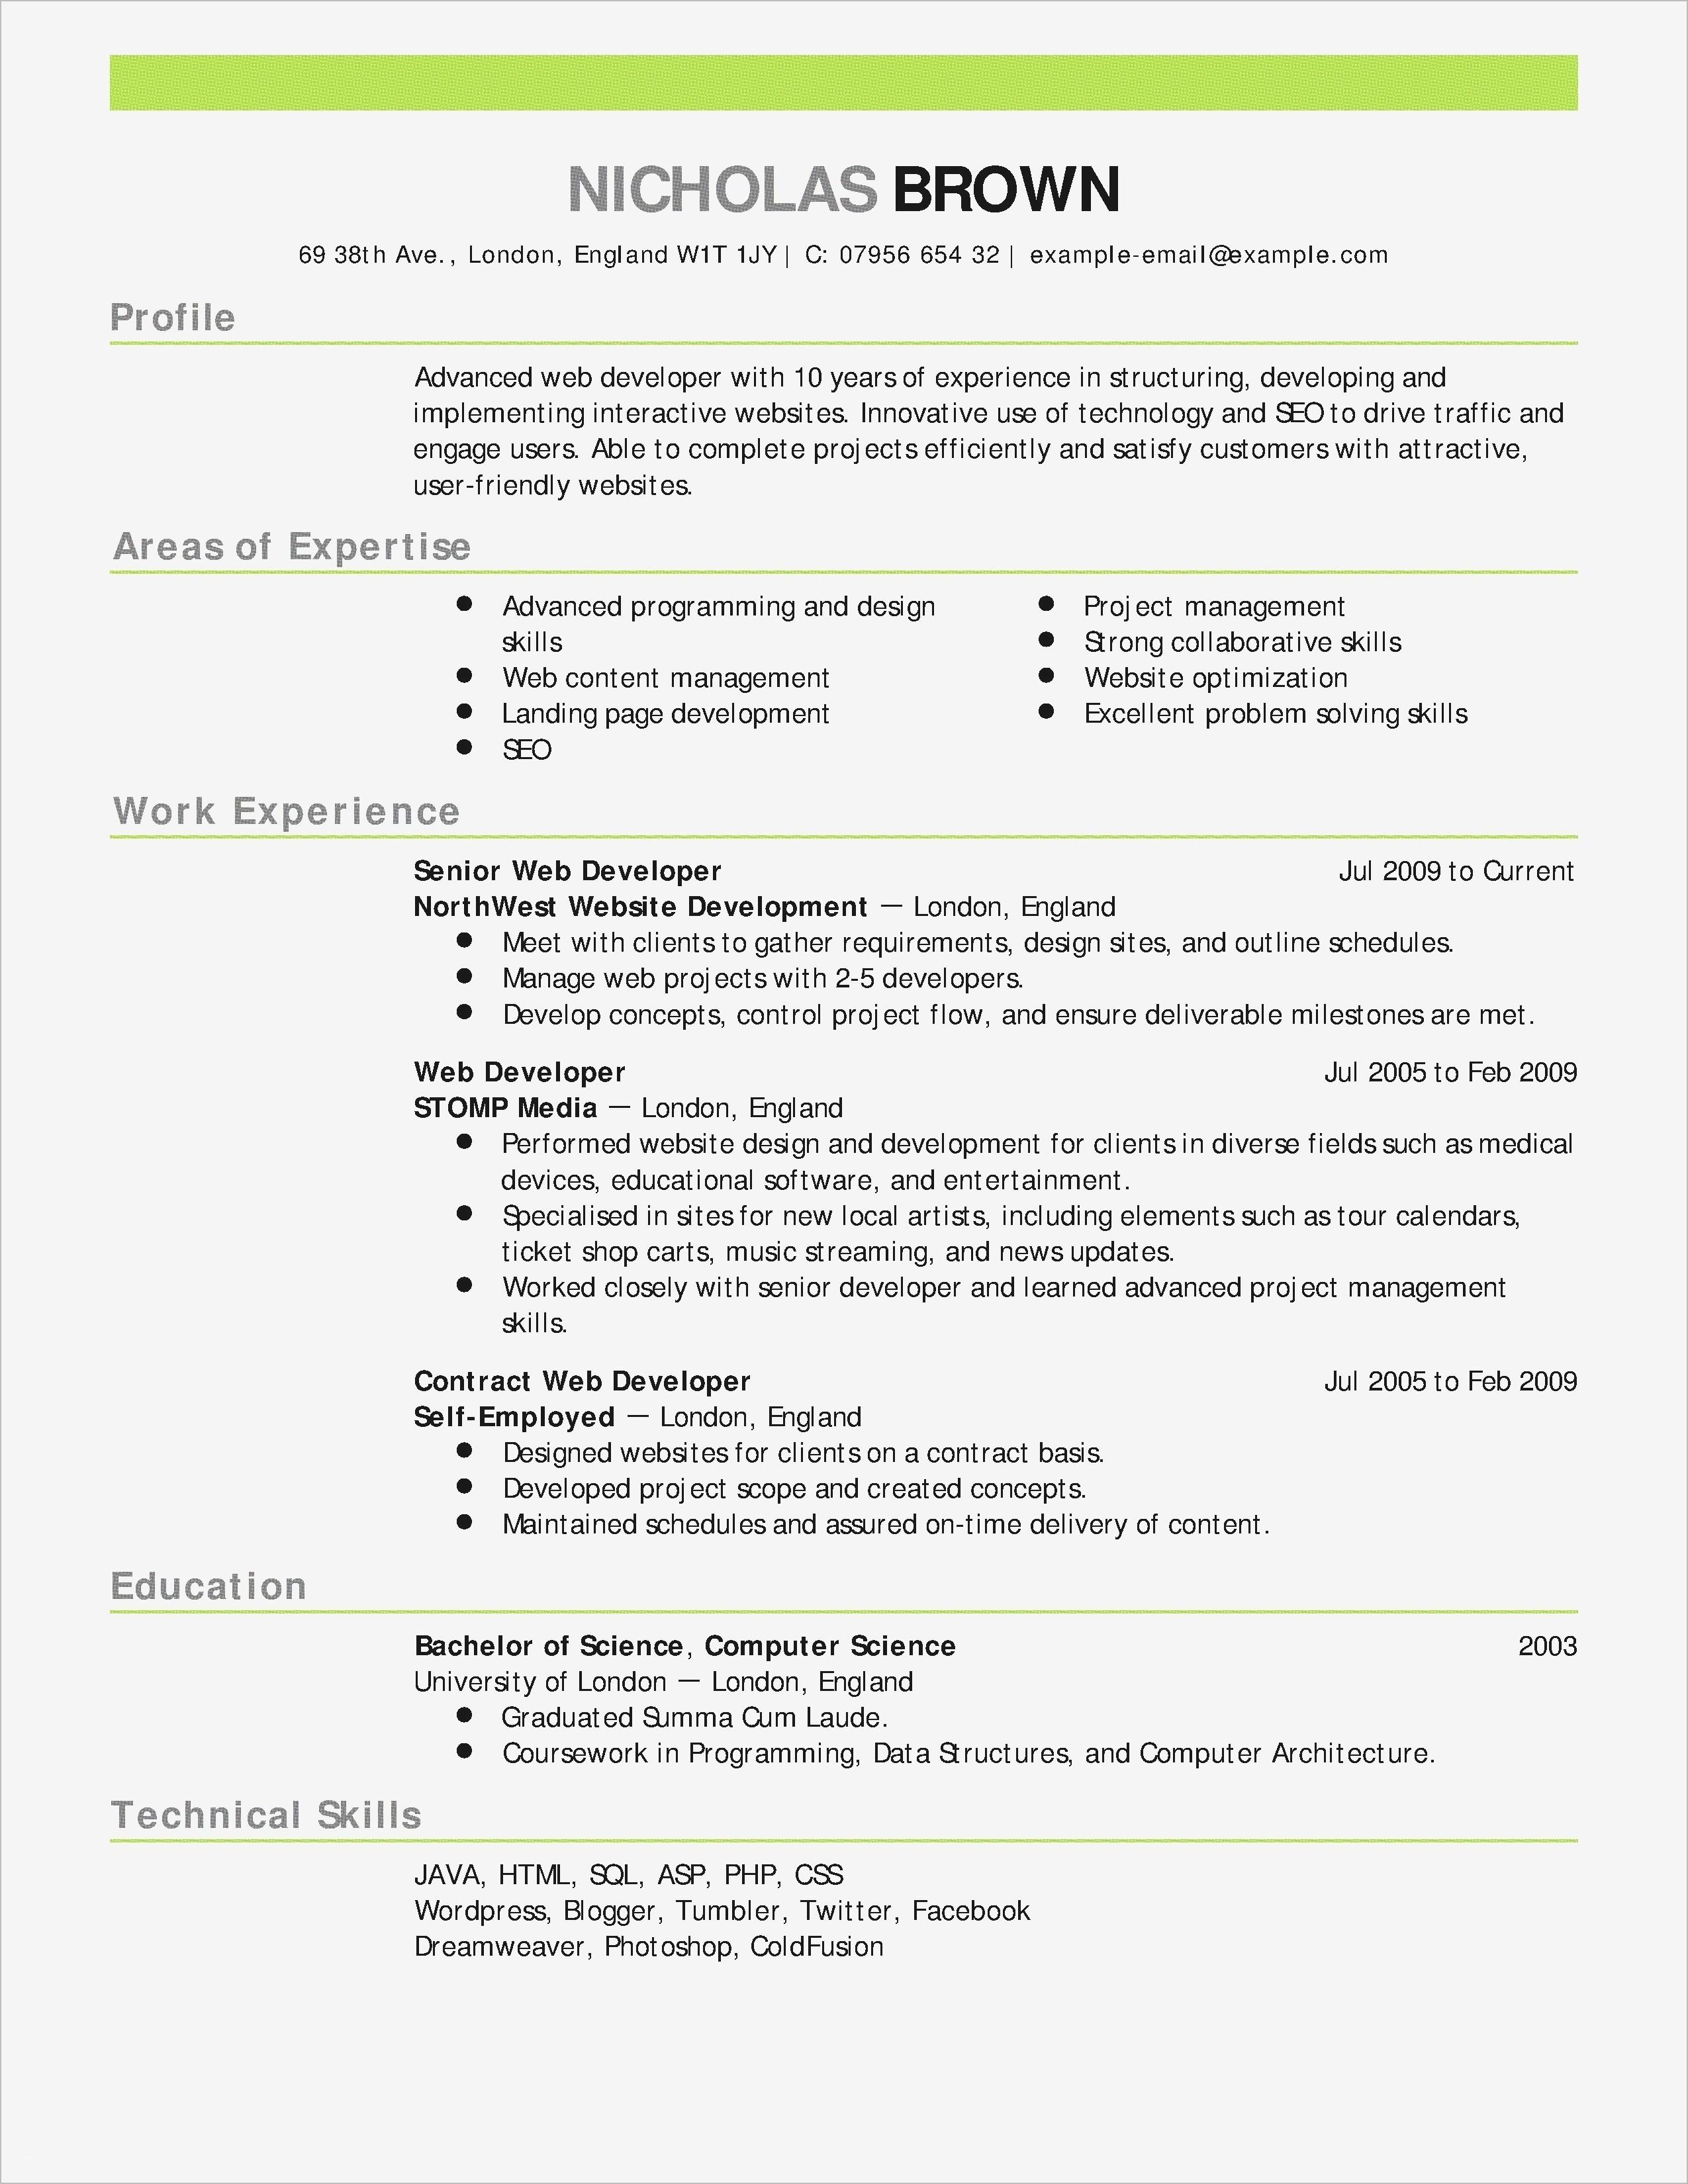 Preschool Teacher Resume Preschool Teacher Resume New Resume For Preschool Teacher